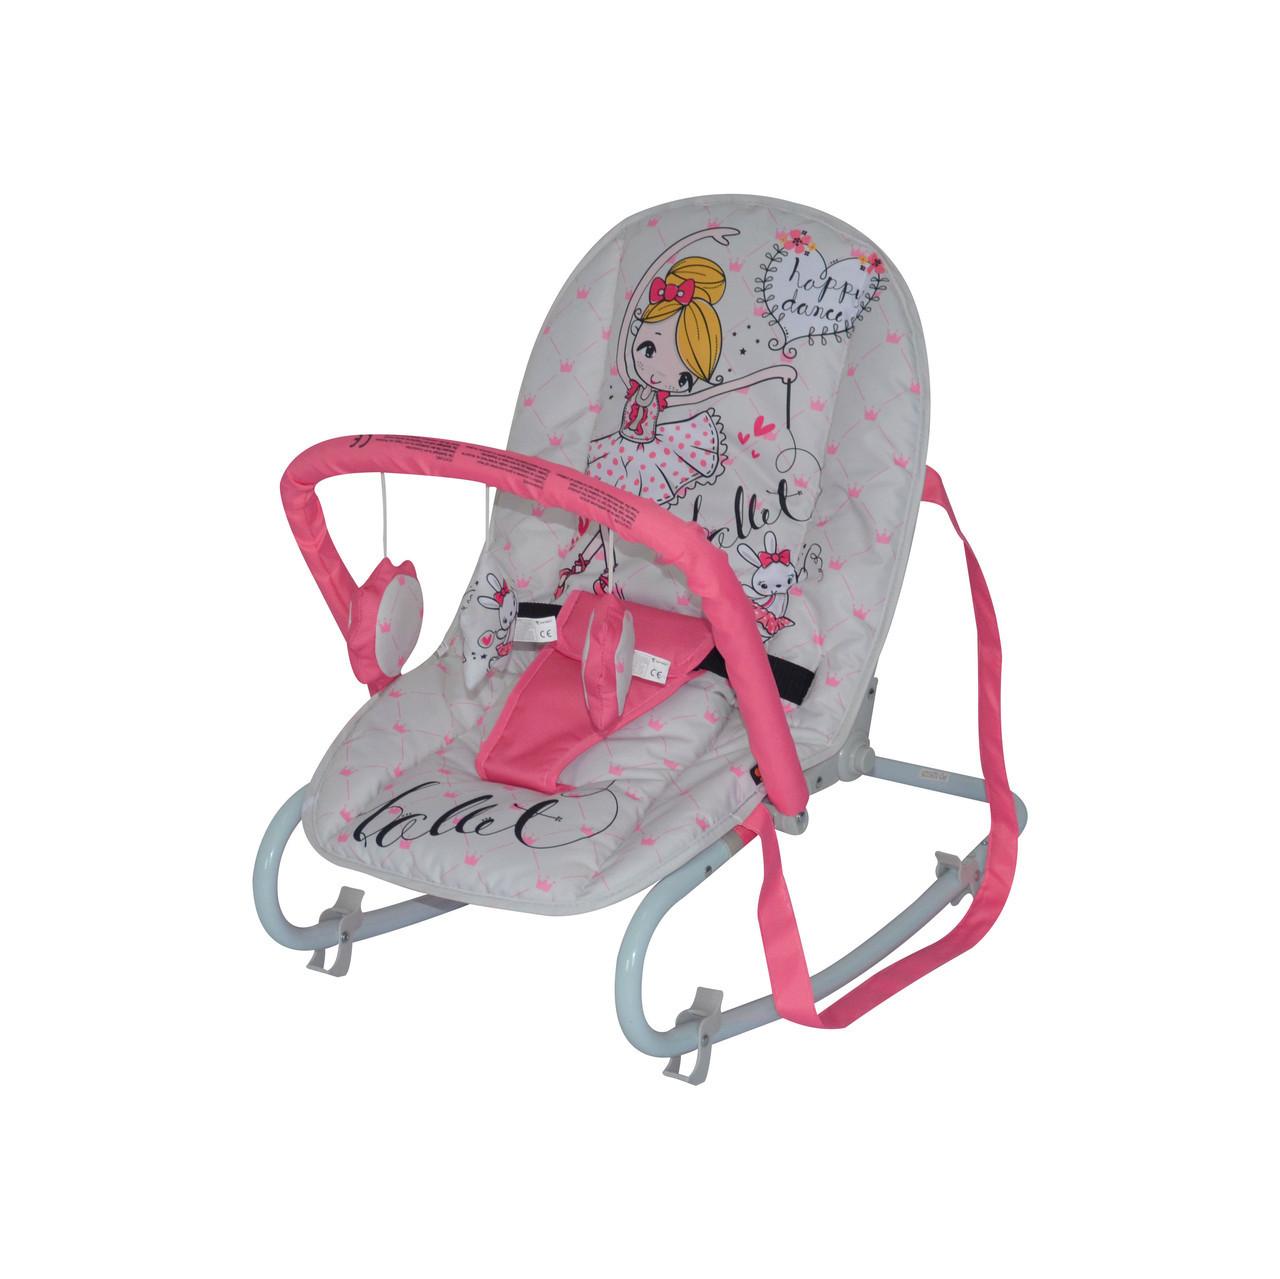 Шезлонг Lorelli Top relax pink ballet